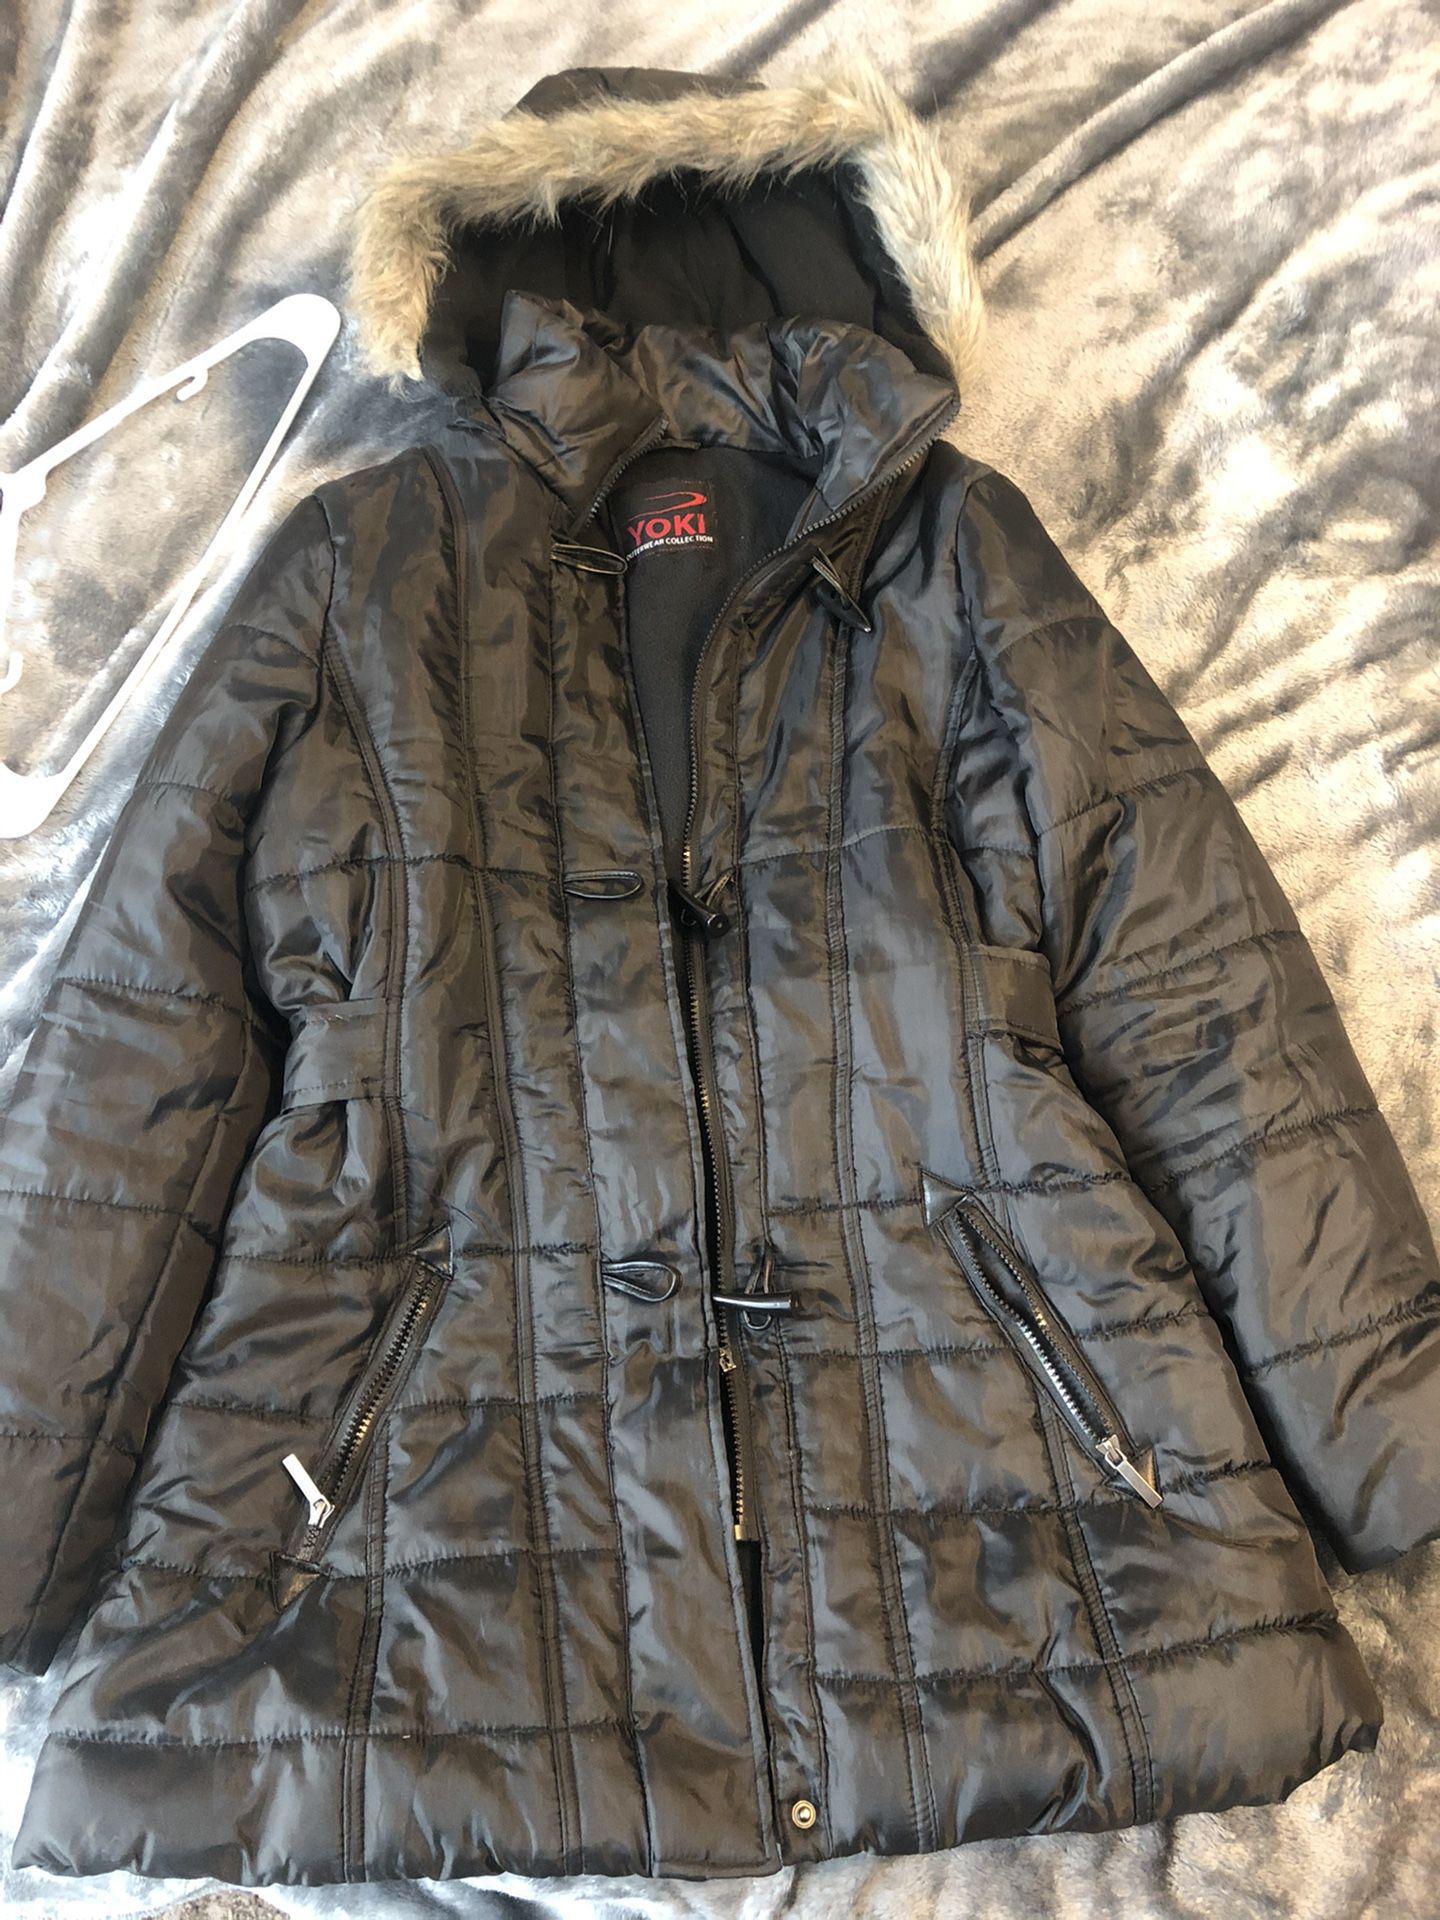 Yoki windbreaker jacket fuzzy hood, Large